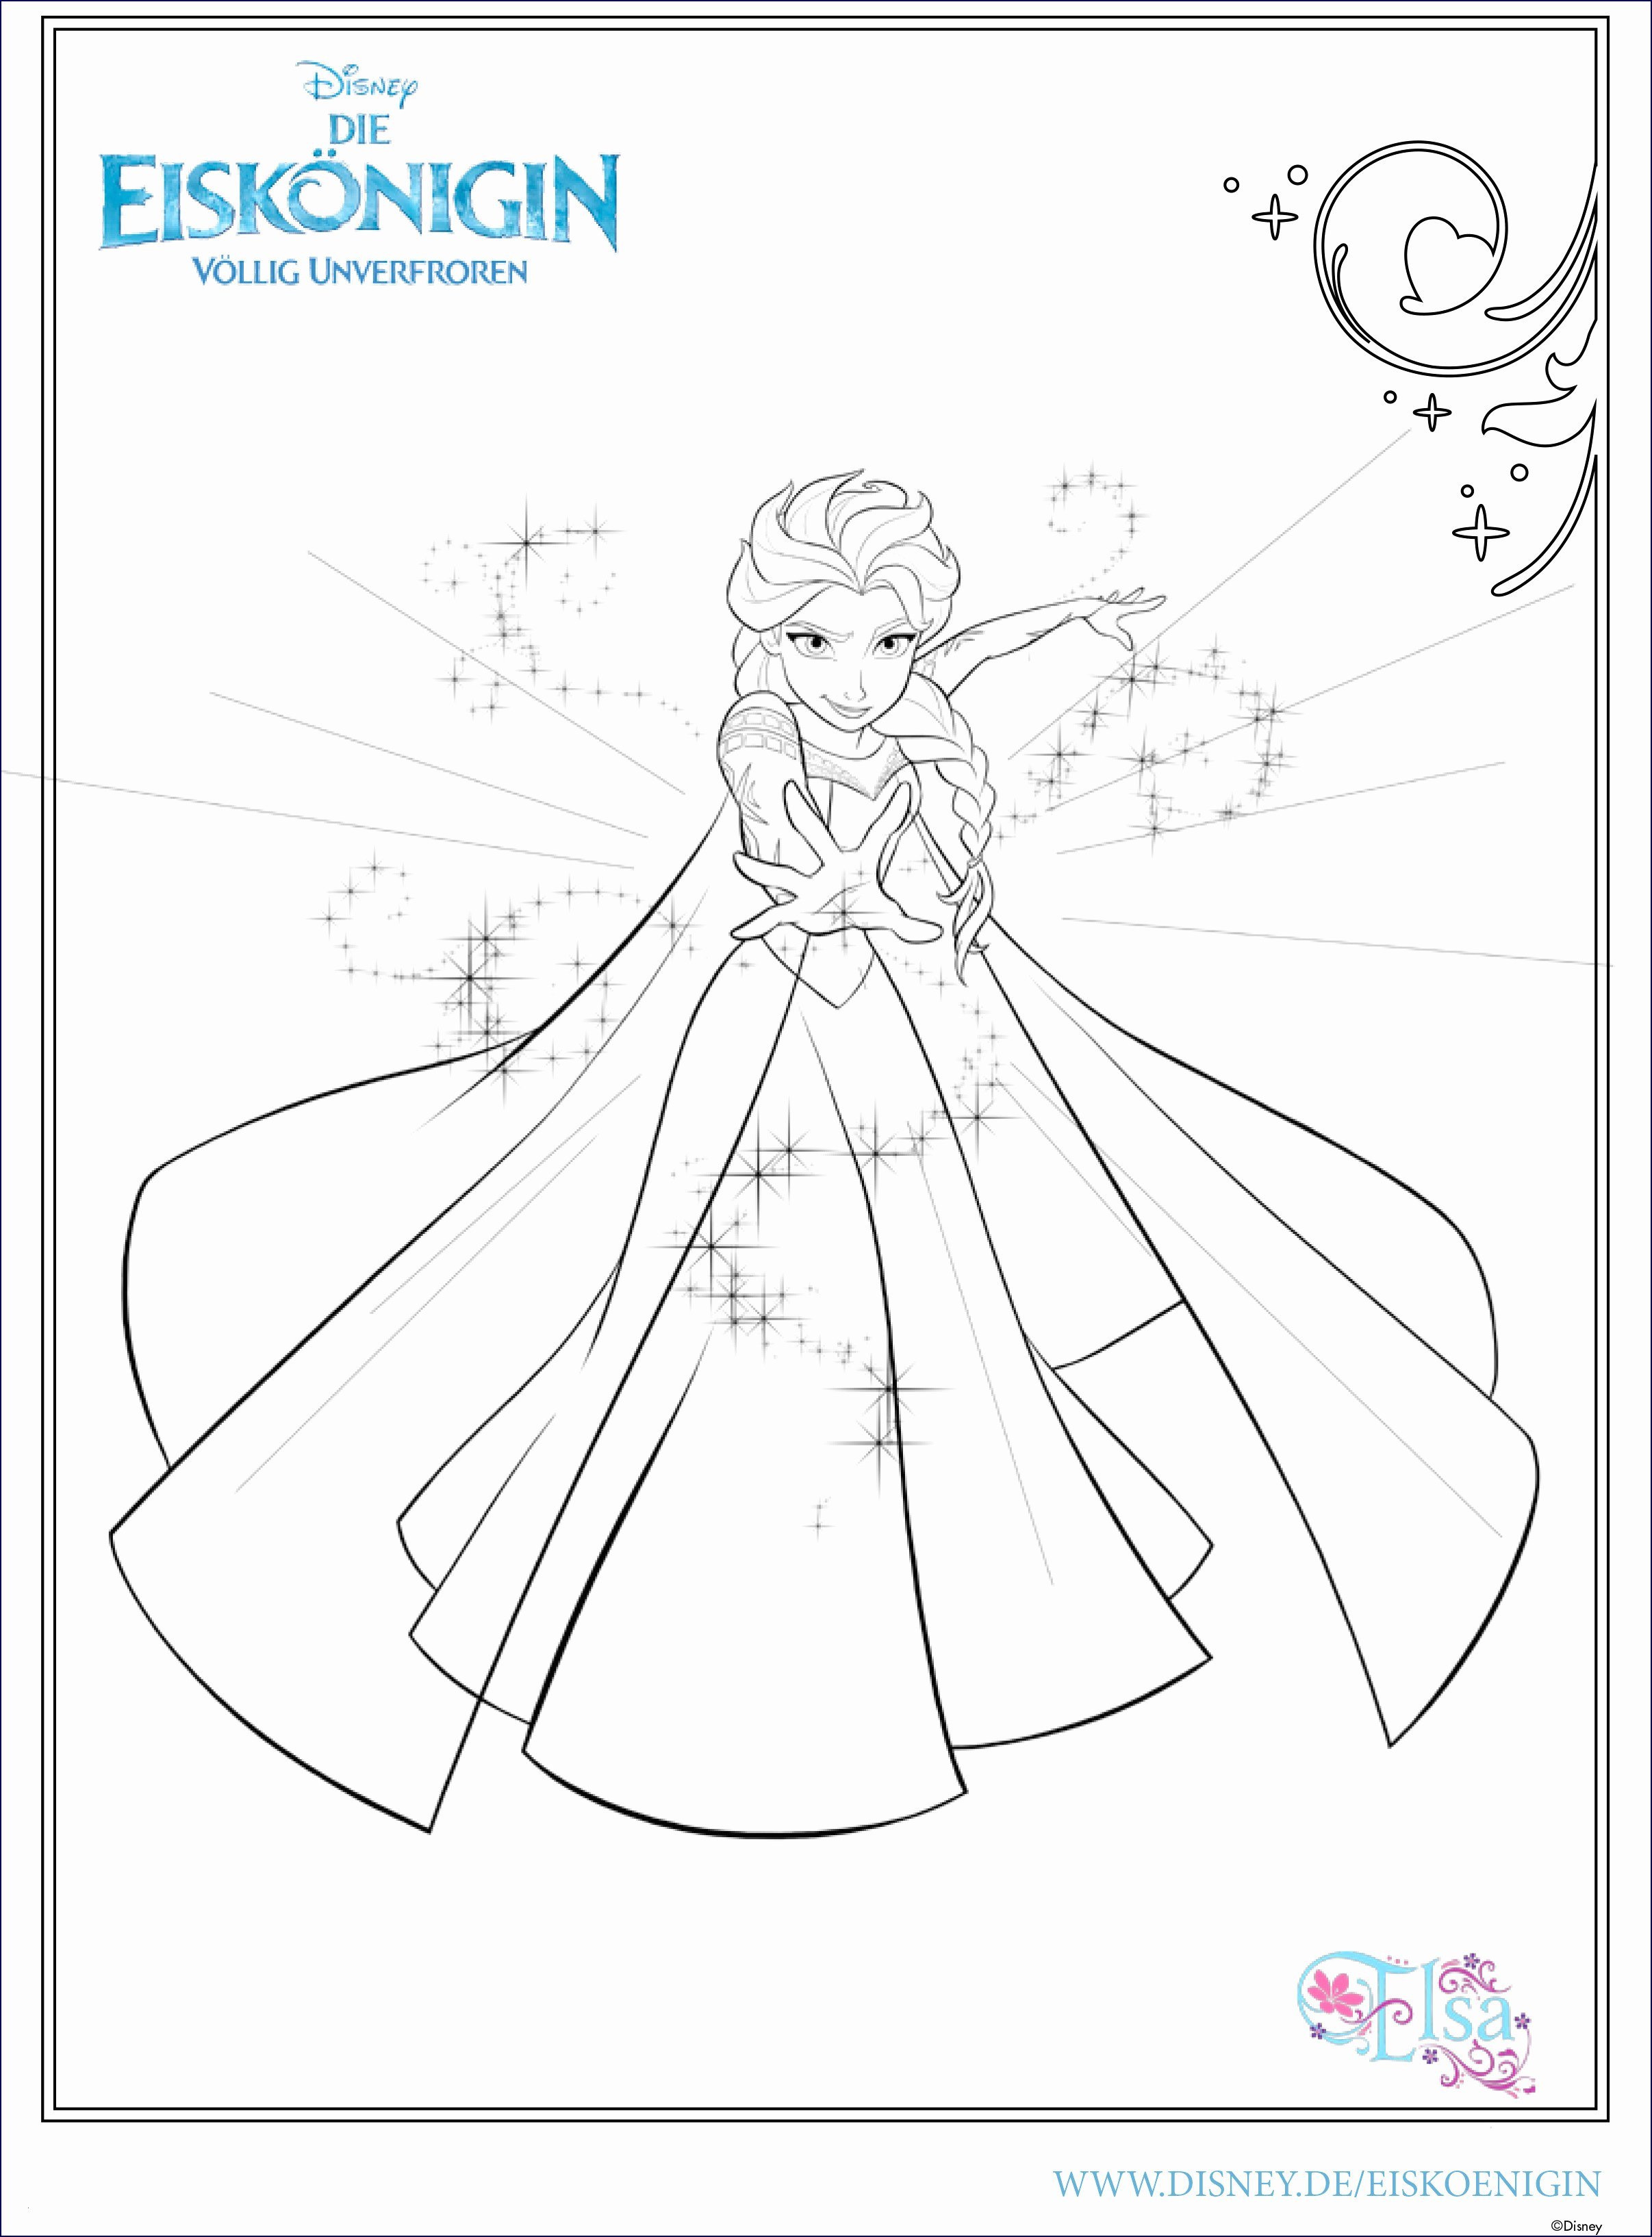 Harry Potter Ausmalbilder Wappen Das Beste Von 38 Elsa Frozen Ausmalbilder Scoredatscore Elegant Harry Potter Bilder